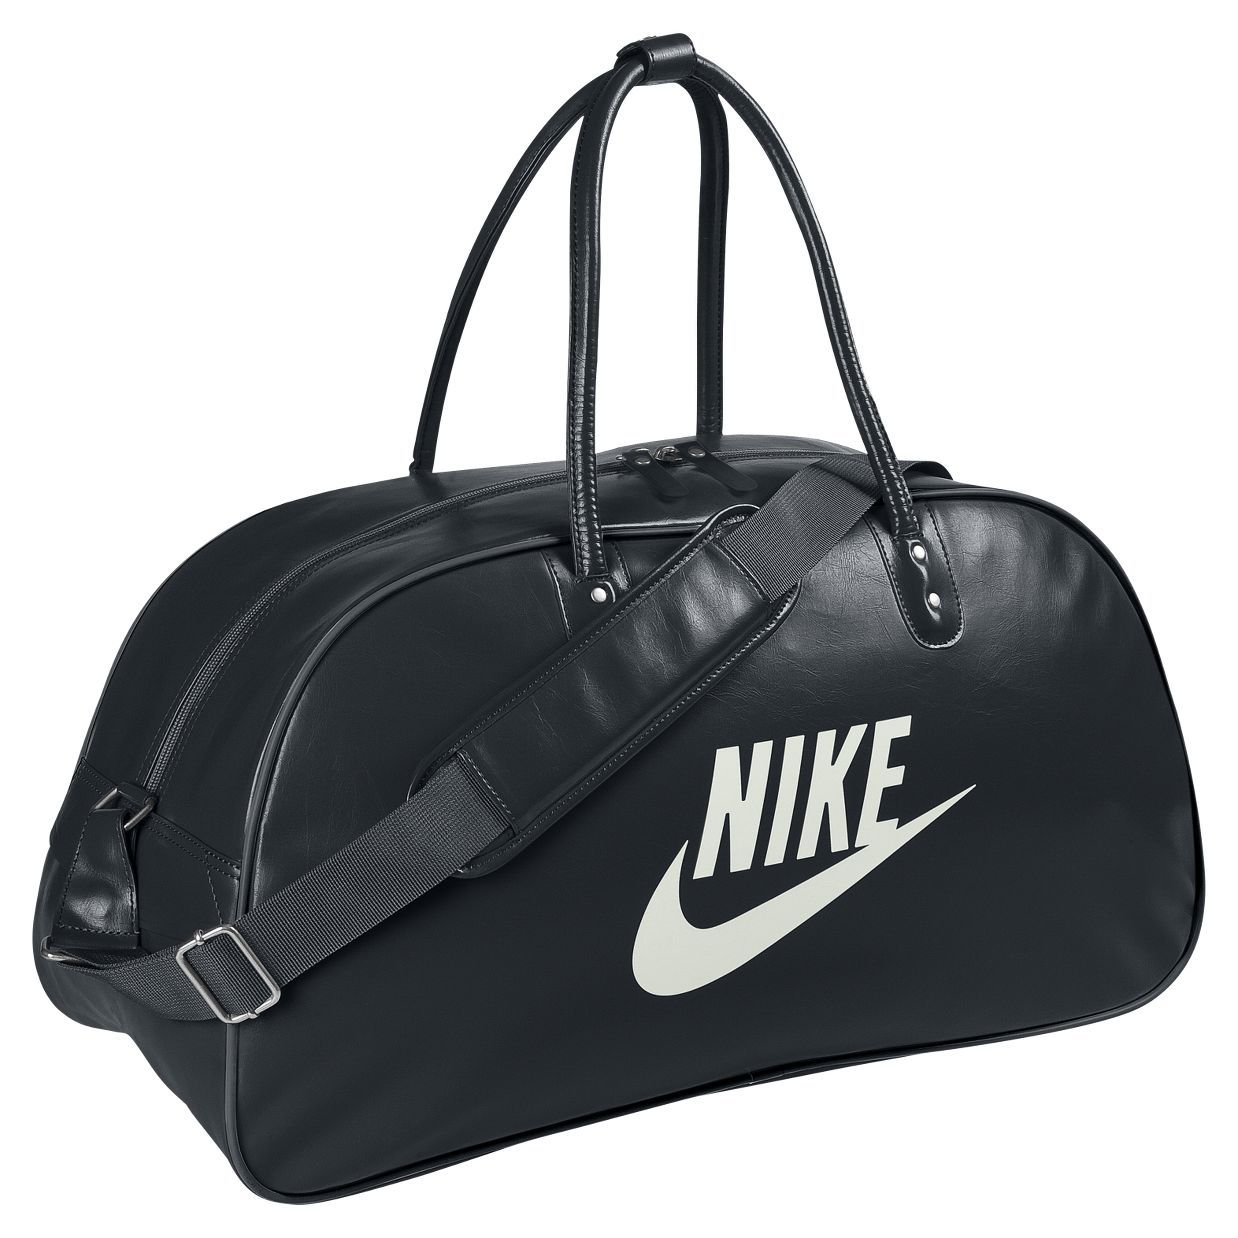 España Style Heritage Nike Club De Men's Bolsa Deporte Store fP5F5wCnq